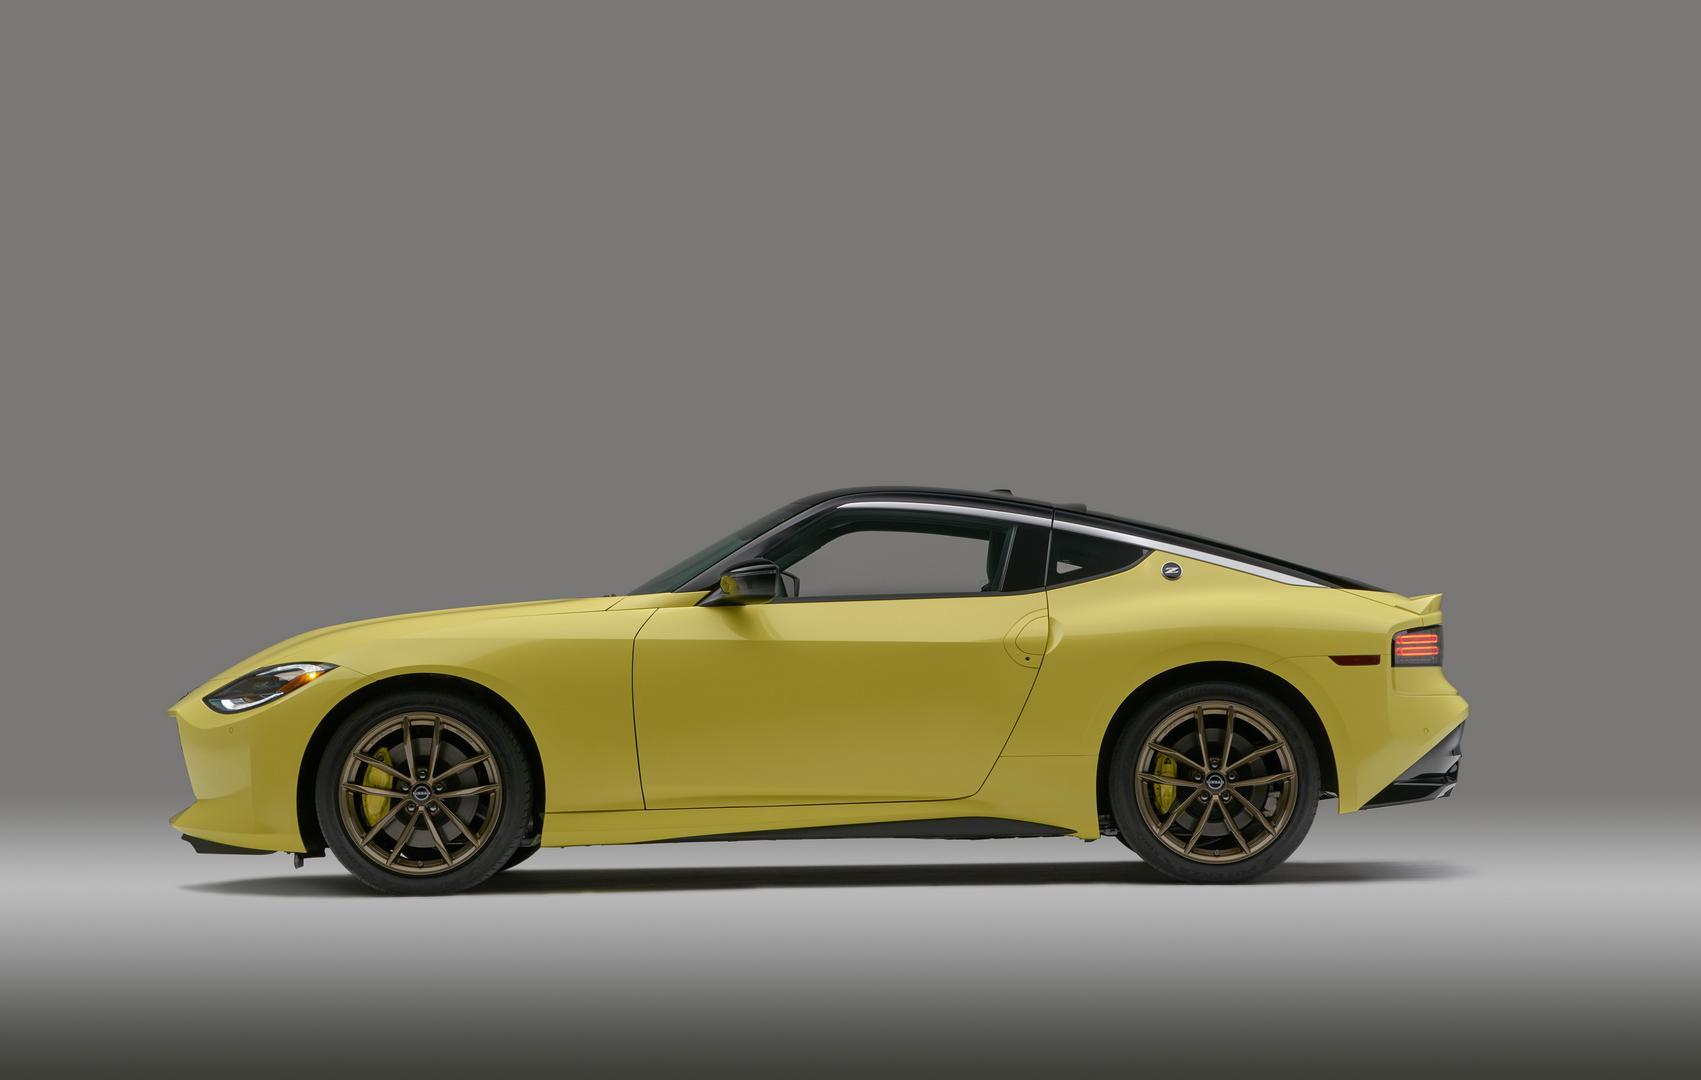 2022 Nissan Z Proto Spec side